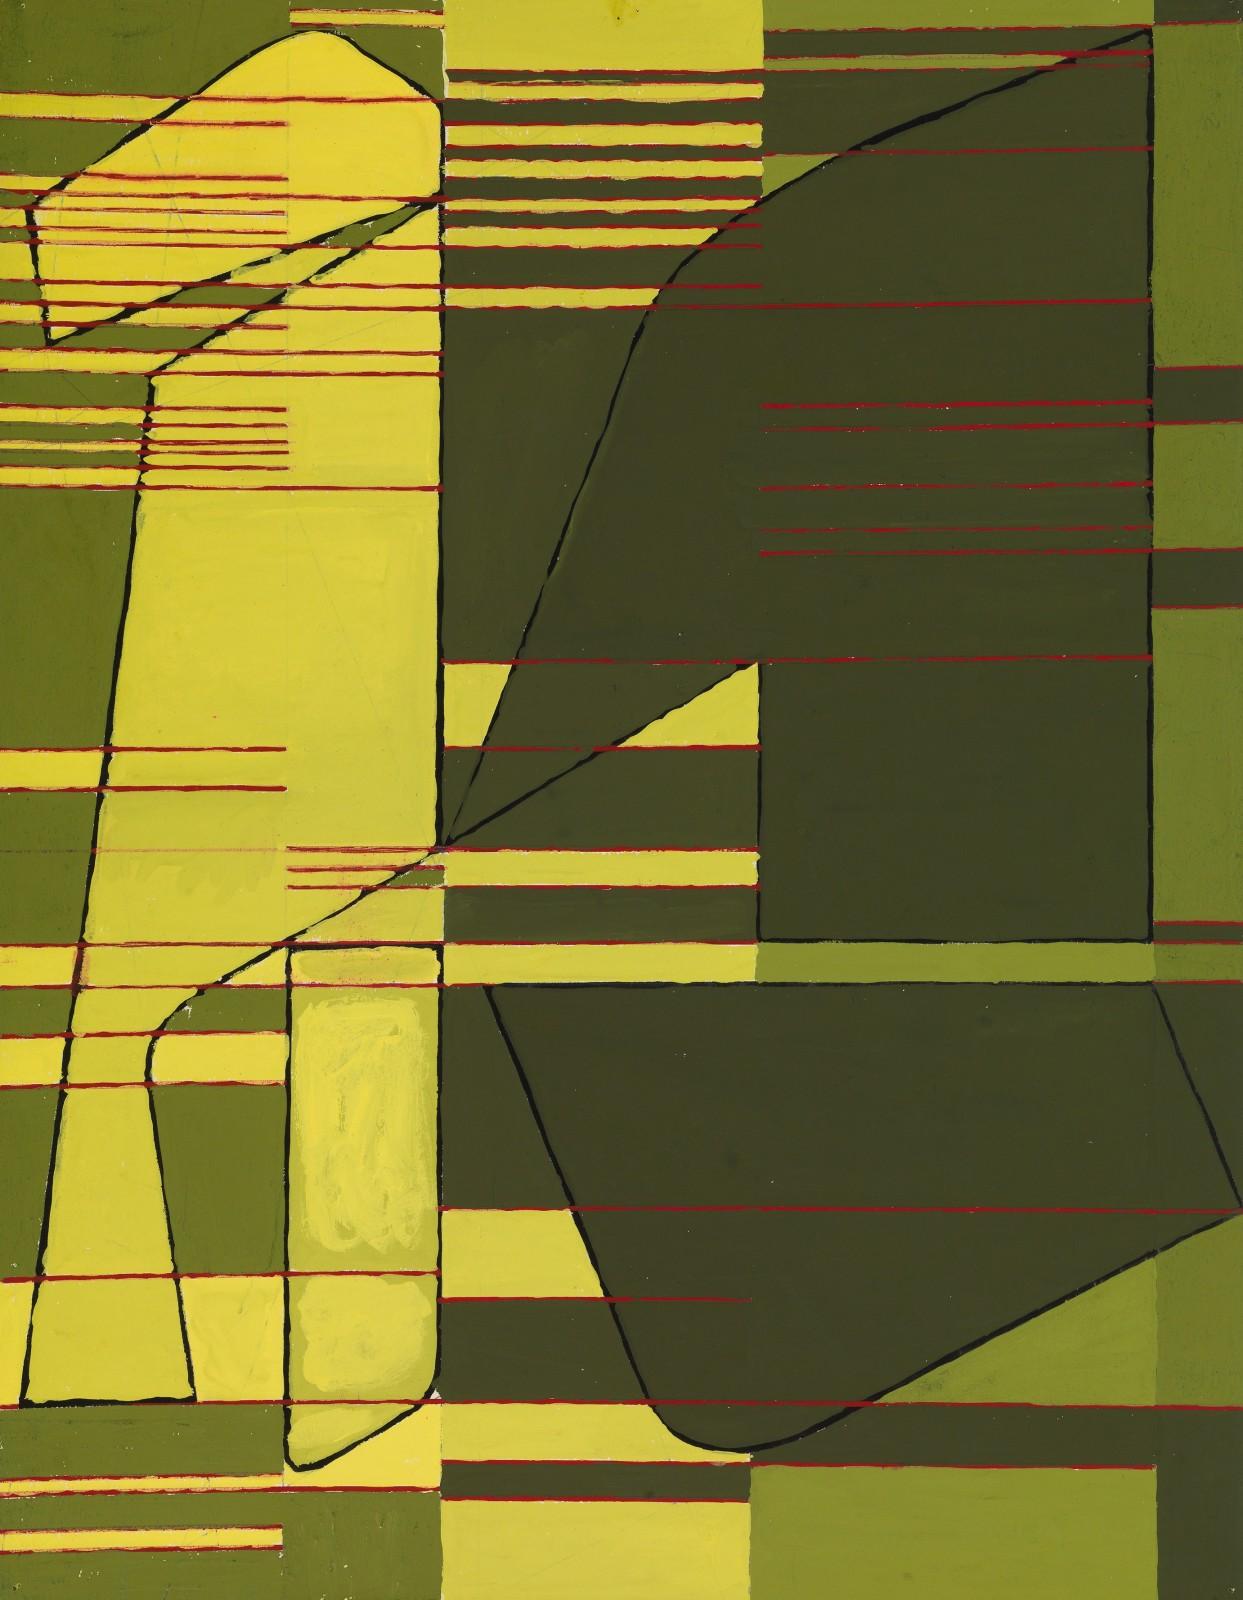 "<span class=""link fancybox-details-link""><a href=""/artists/106-wifredo-arcay/works/10373/"">View Detail Page</a></span><div class=""artist""><span class=""artist""><strong>WIFREDO ARCAY</strong></span></div><div class=""title""><em>Untitled</em>, c. 1950</div><div class=""medium"">Gouache on paper</div><div class=""dimensions"">54.5 x 42 cm<br /> 21 ½ x 16 ½ inches</div>"